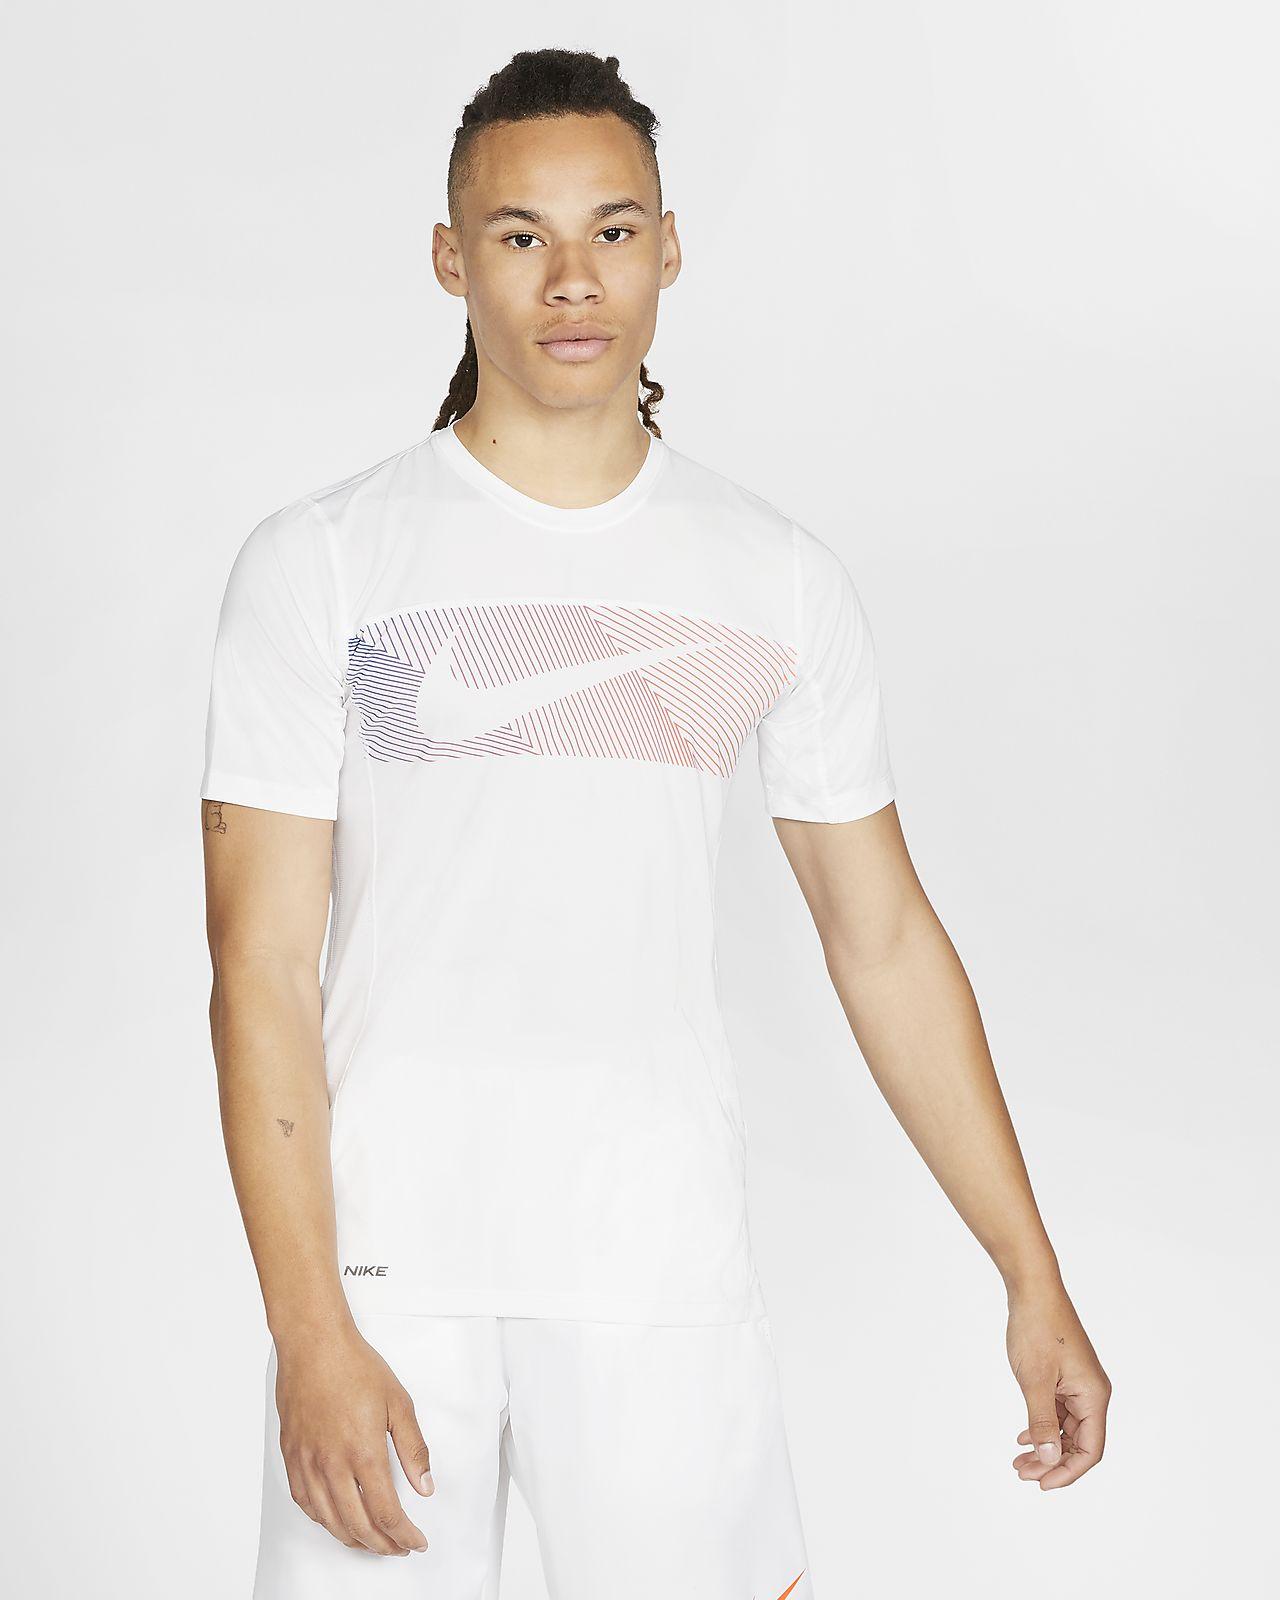 Nike Men's Short-Sleeve Graphic Training Top